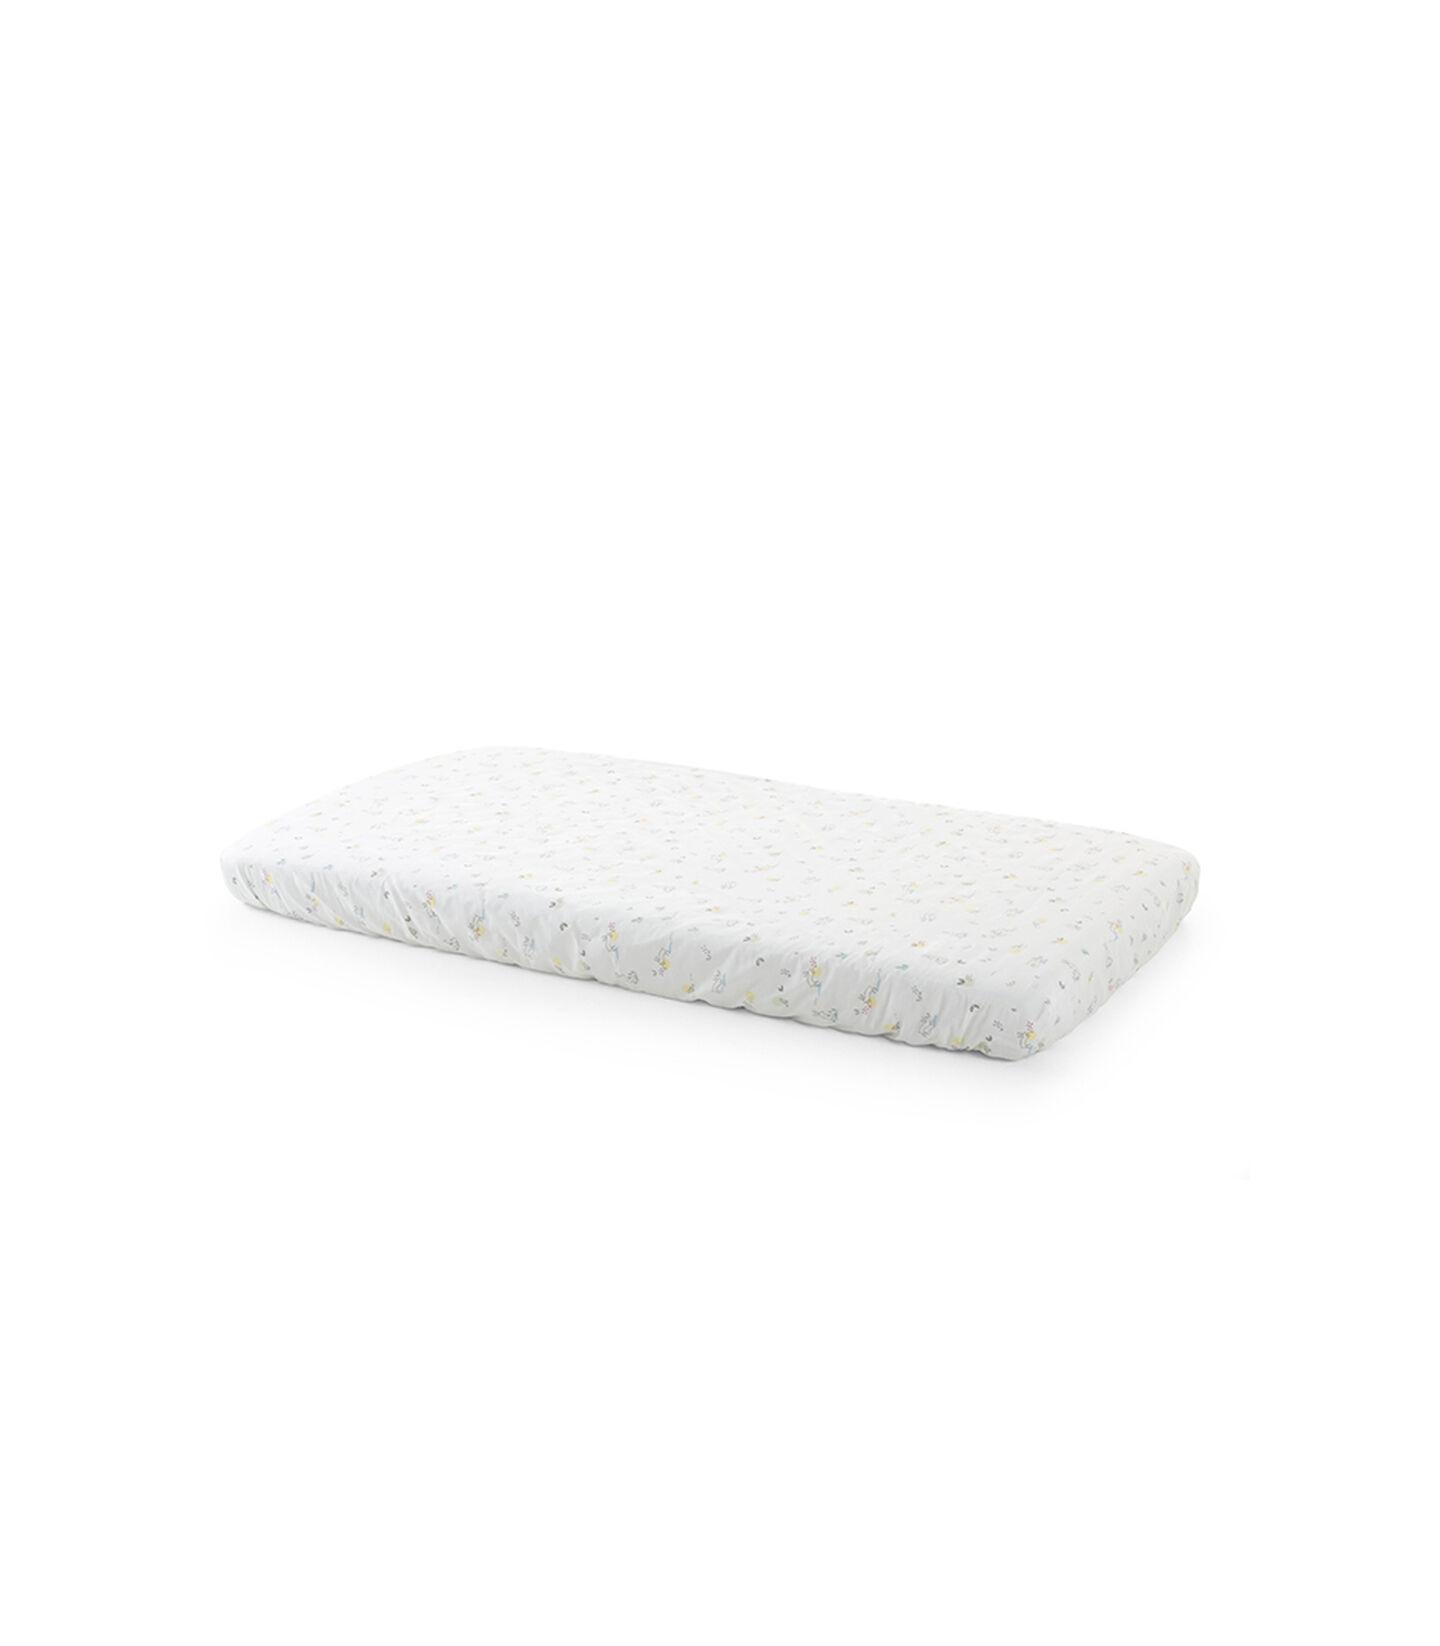 2 Sábanas Bajeras para Cuna Stokke® Home™ - Soft Rabbit, Soft Rabbit, mainview view 2